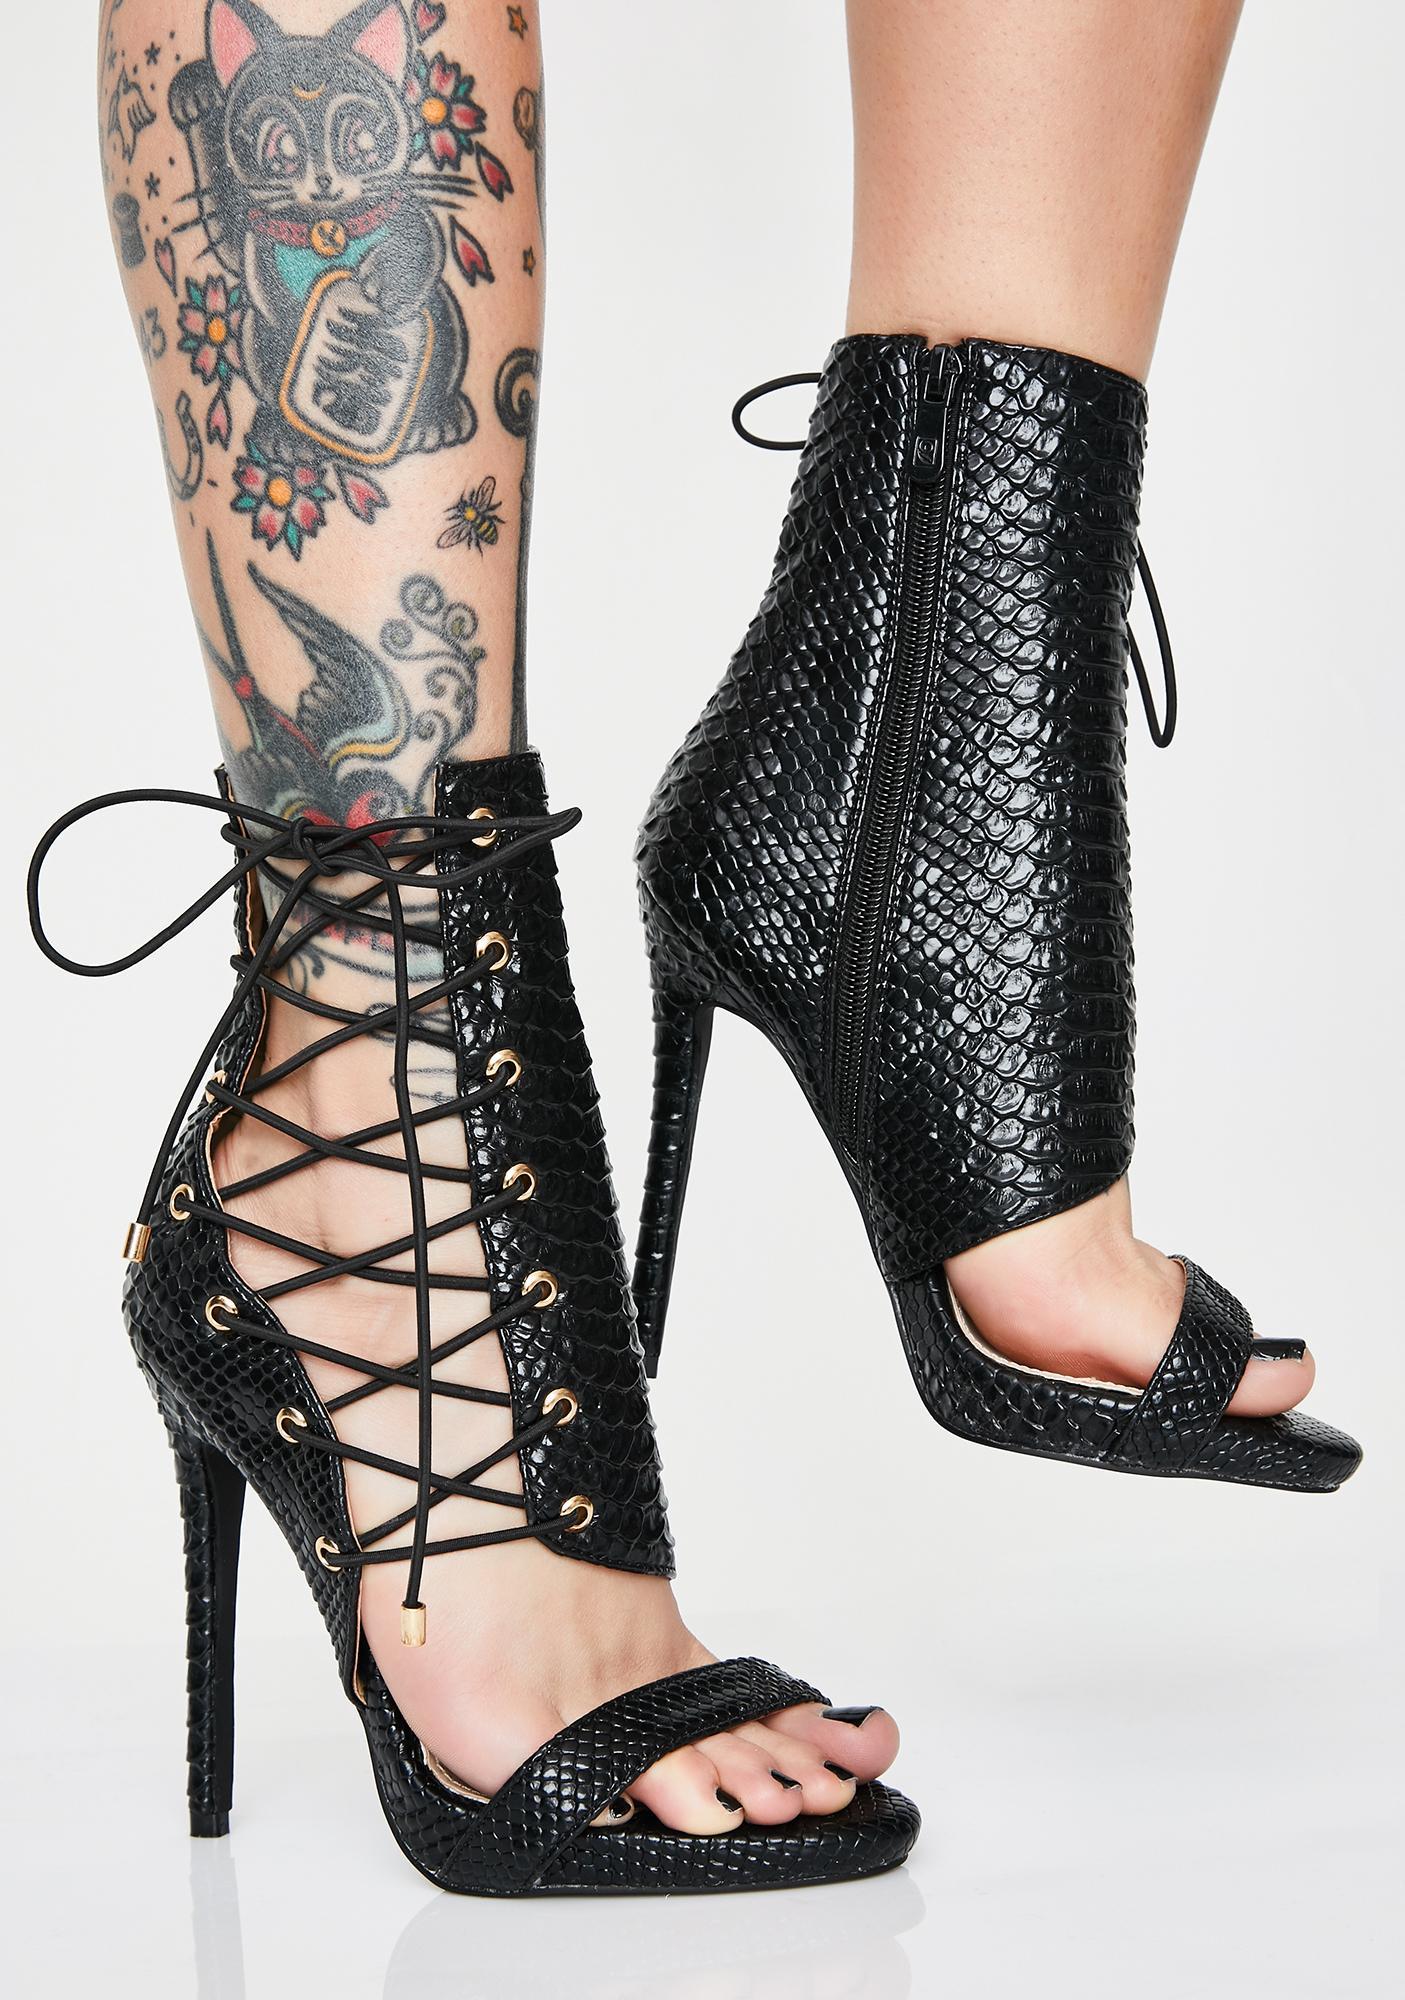 b47734ce5c2 AZALEA WANG Dark Love Me Love Me Not Stiletto Heels